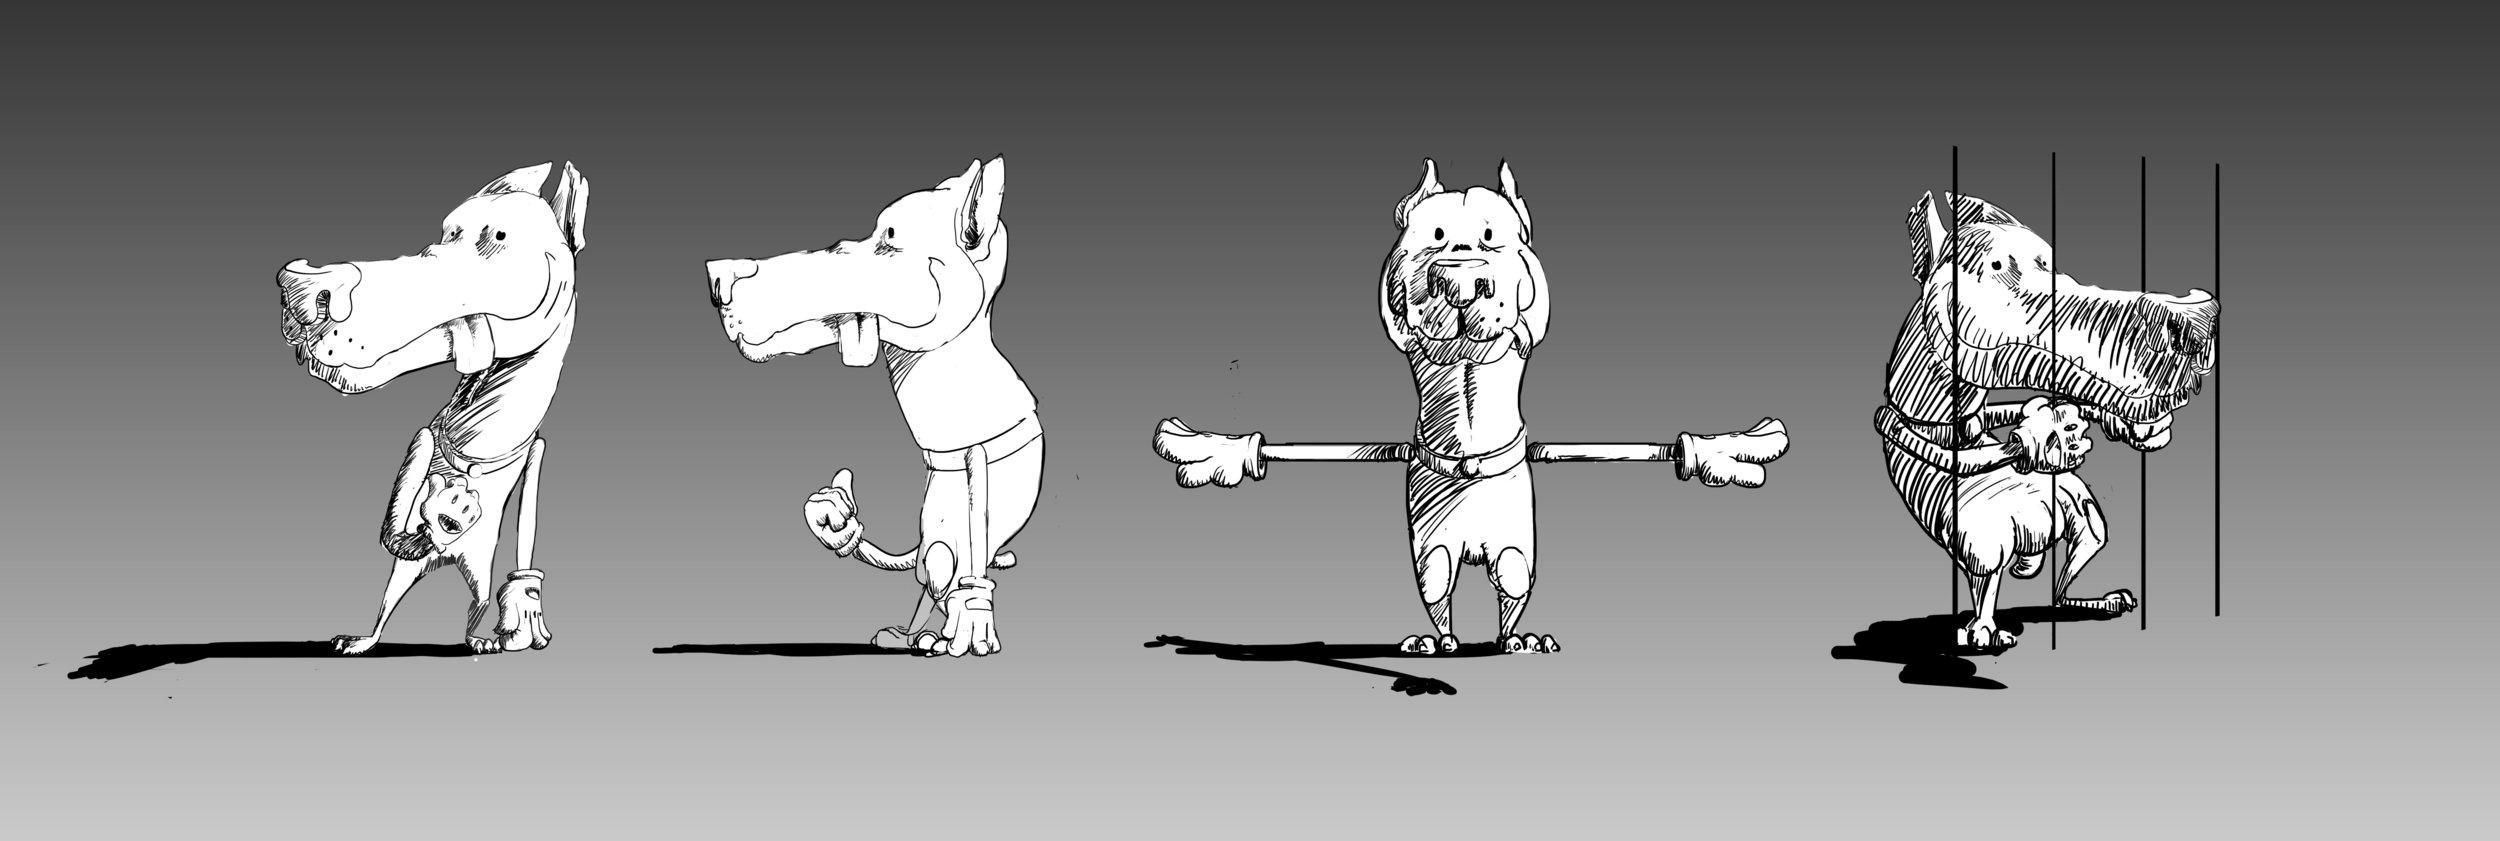 katharsis siriusmo music video 3D dog cartoon mental concept character design